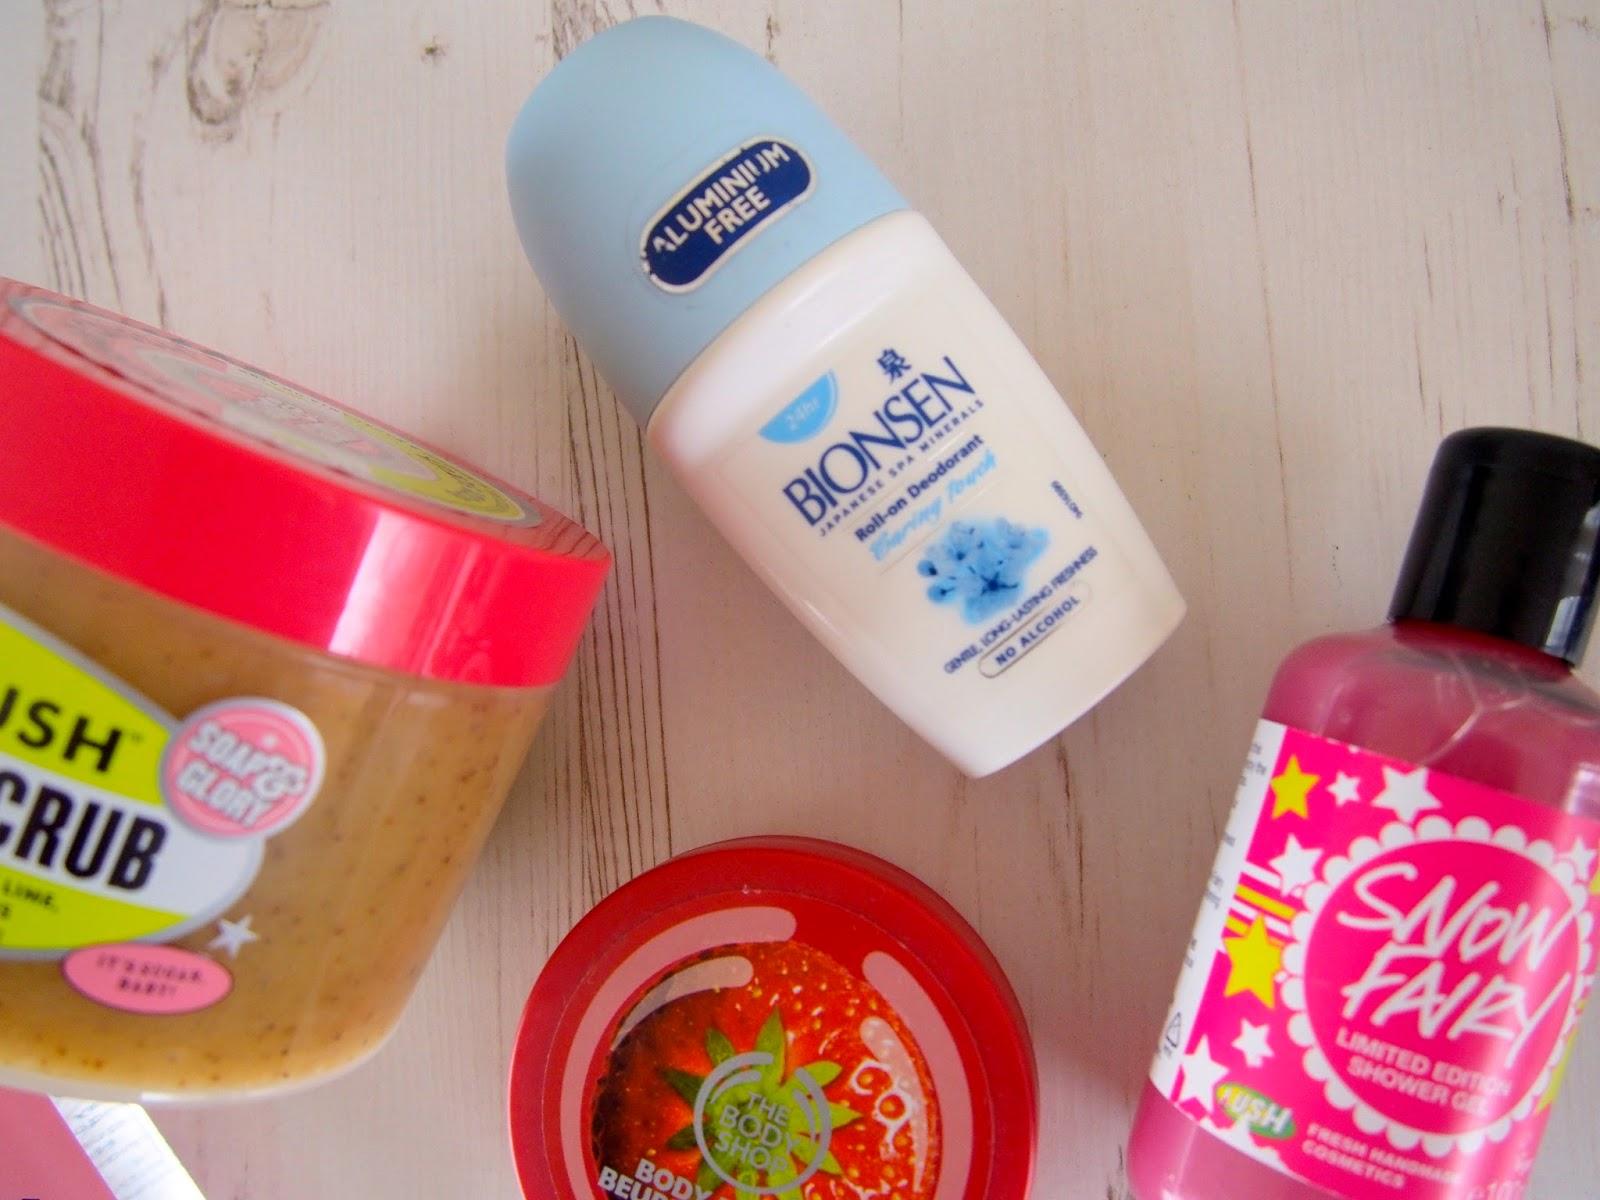 Bionsen Deodorant